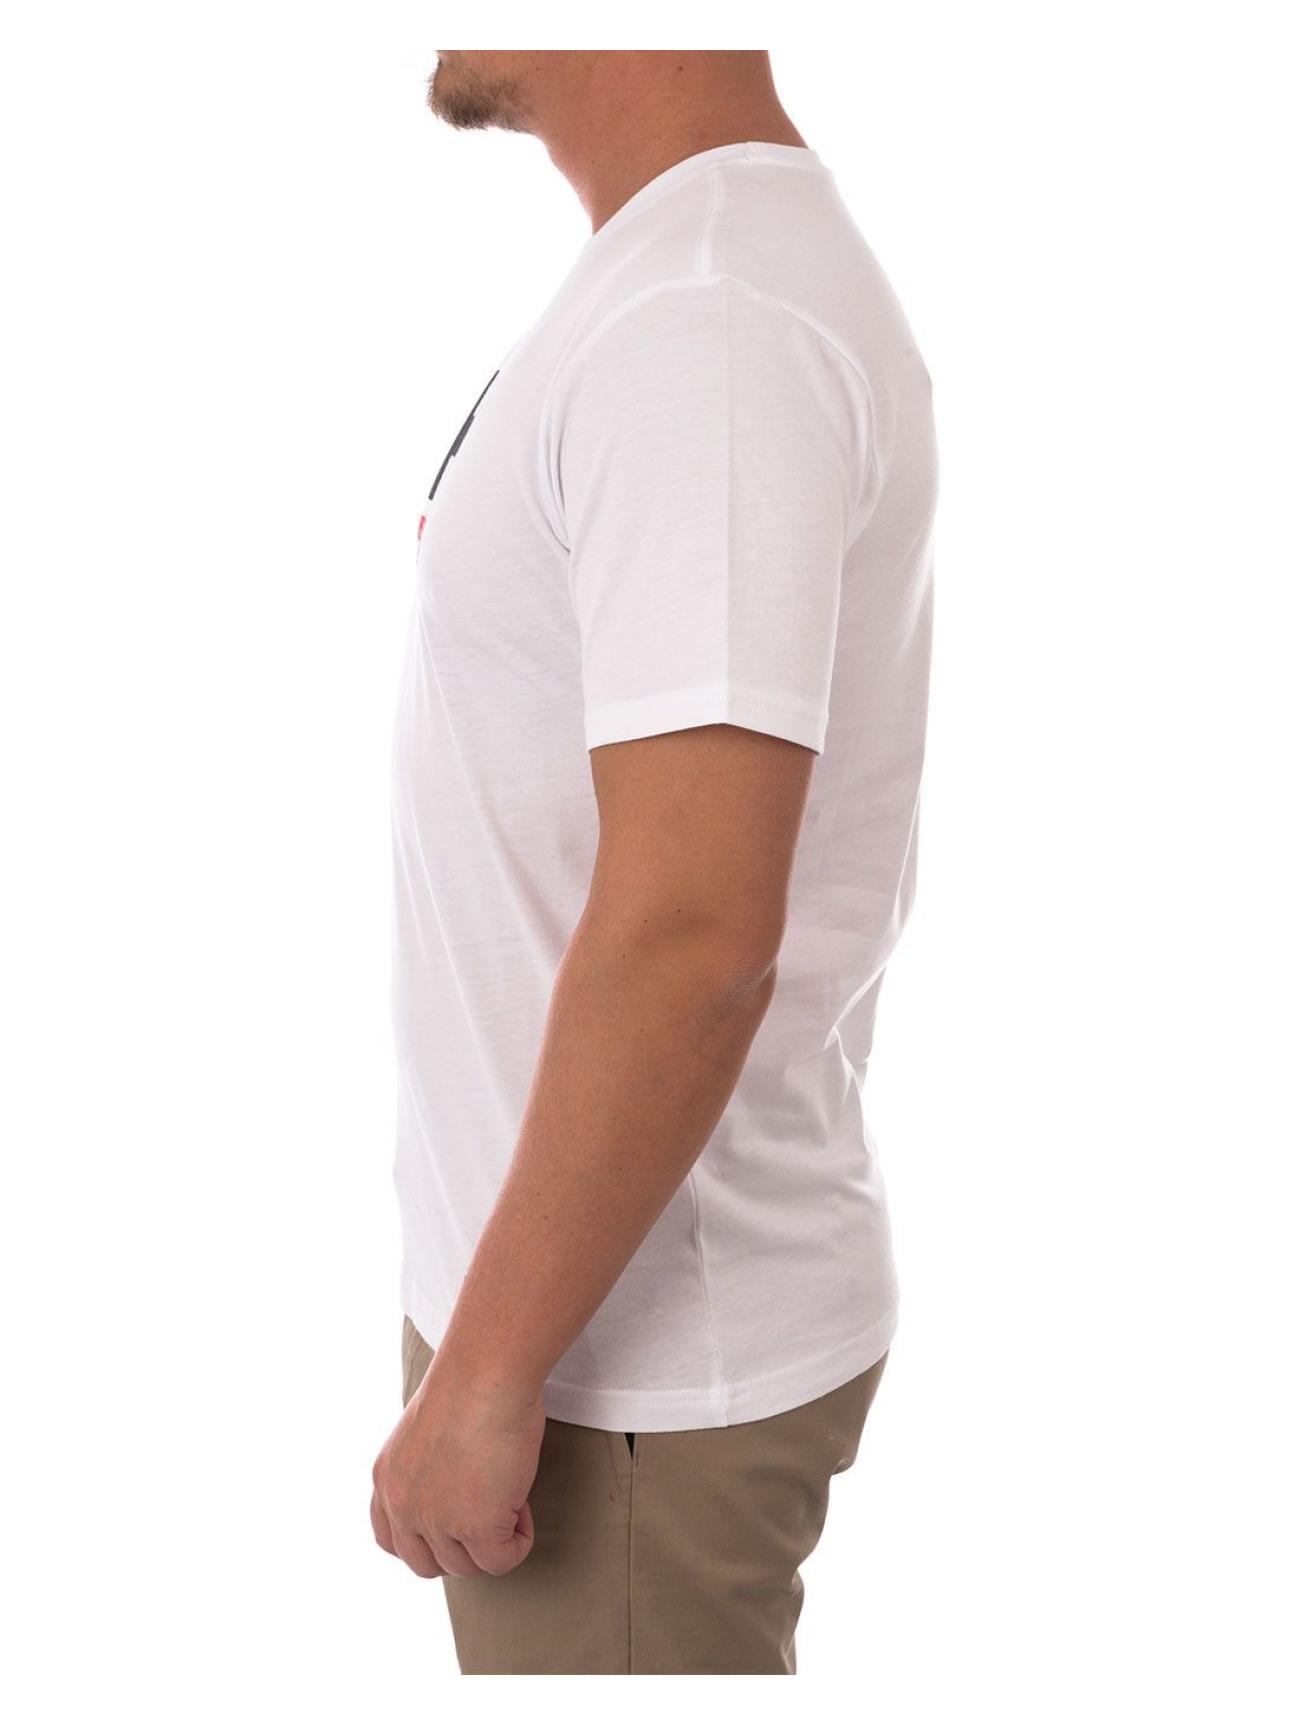 Helly Hansen | Logo  blanc Homme T-Shirt  562001| Homme Hauts